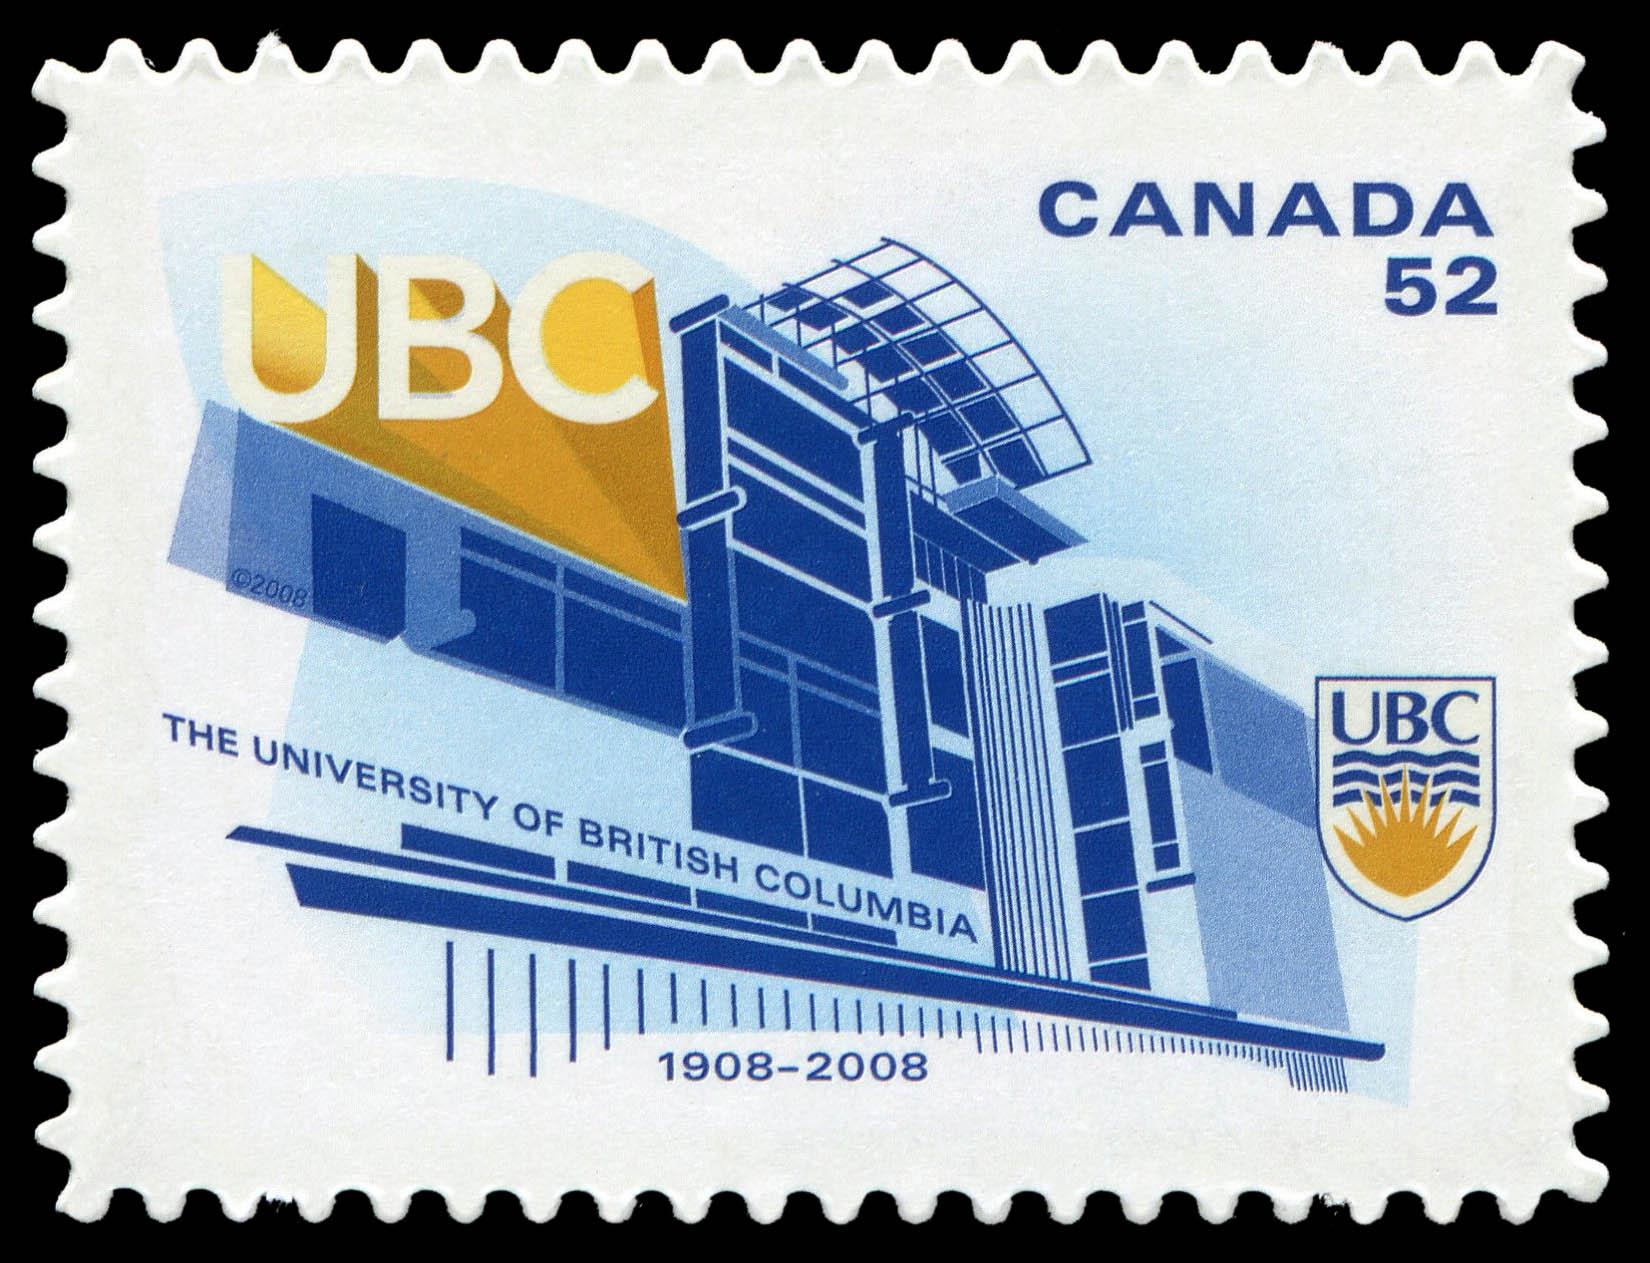 The University of British Columbia - 1908-2008 Canada Postage Stamp | Canadian Universities